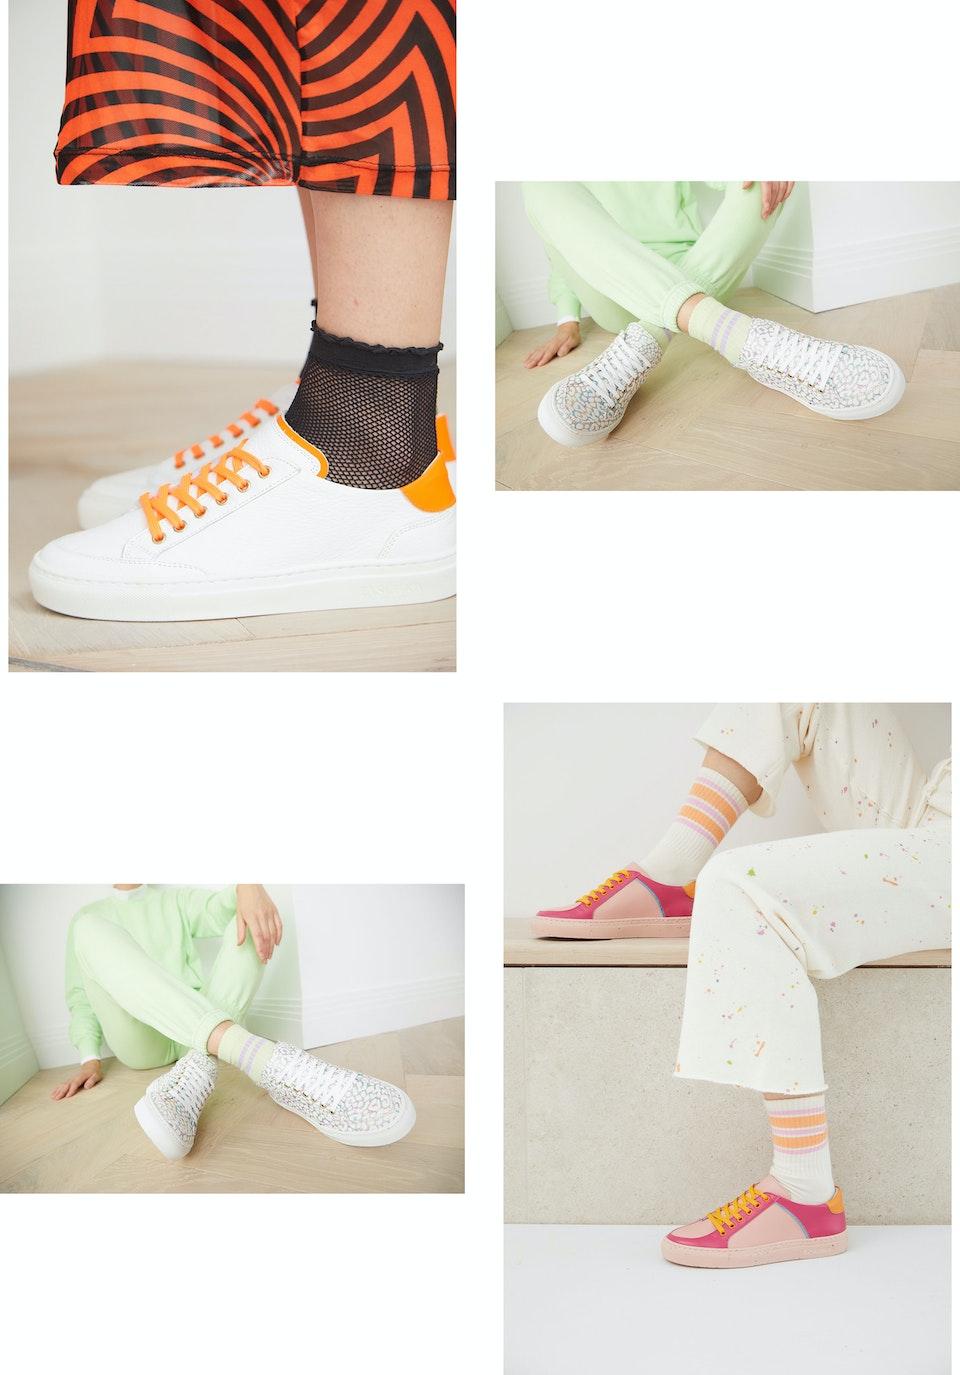 TaschkaShoes_005 -